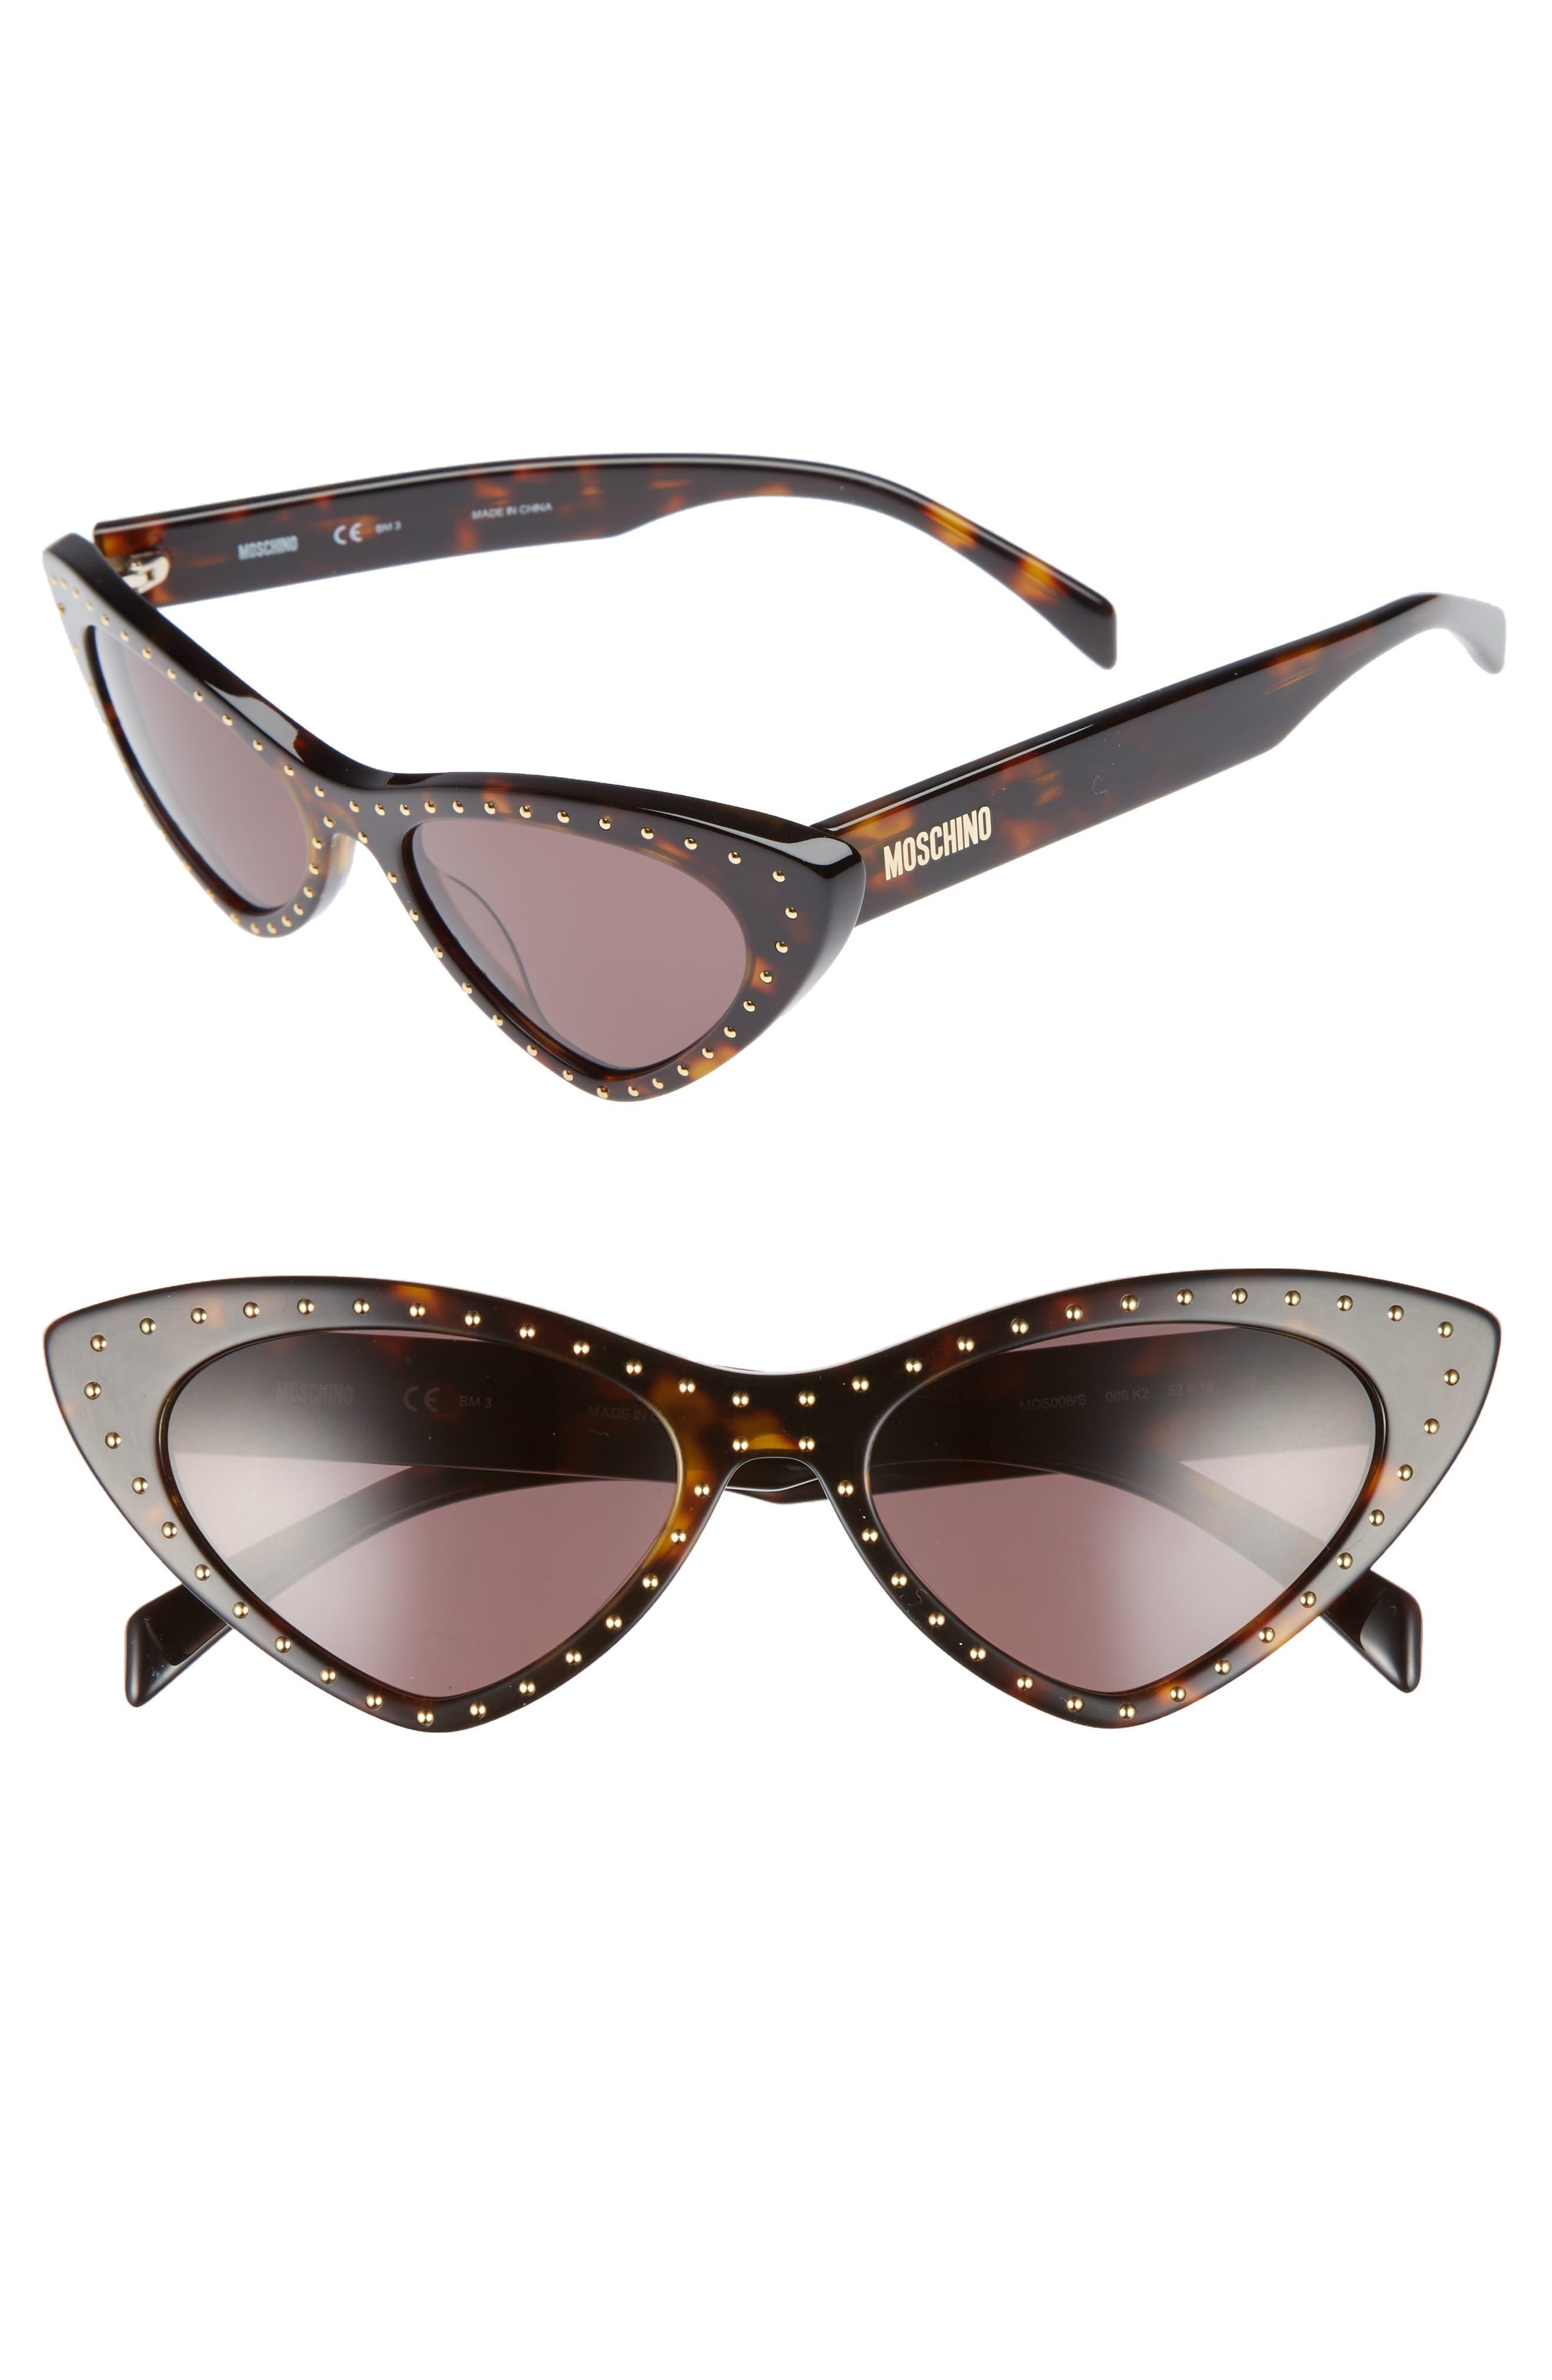 52mm Cat's Eye Sunglasses,                             Main thumbnail 1, color,                             Dark Havana